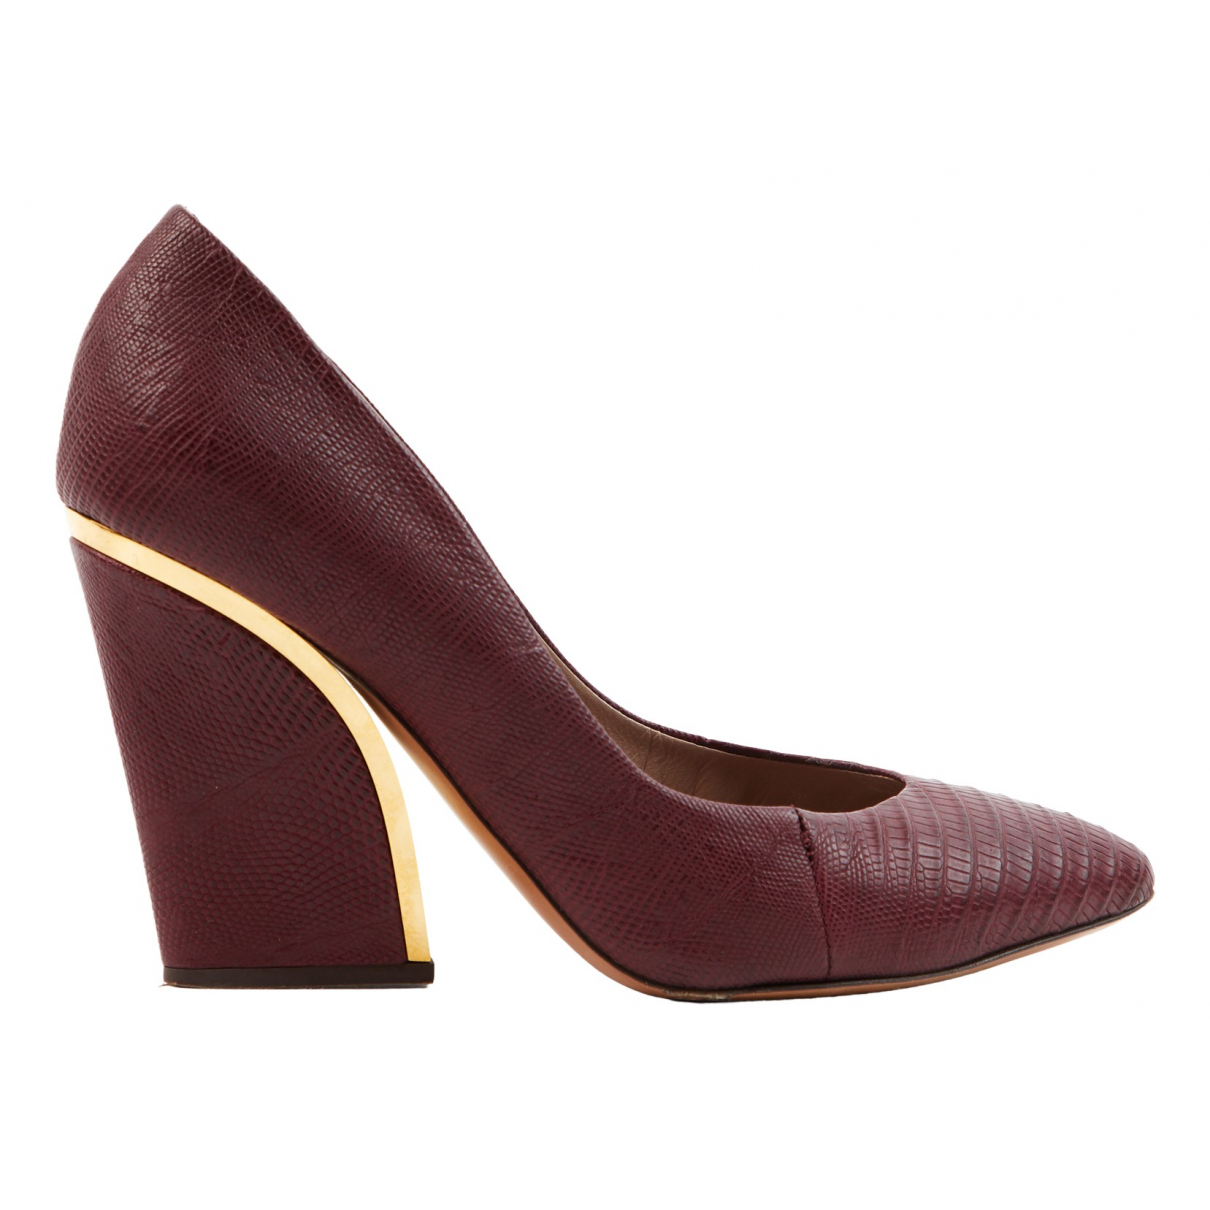 Chloé N Burgundy Leather Heels for Women 38.5 EU